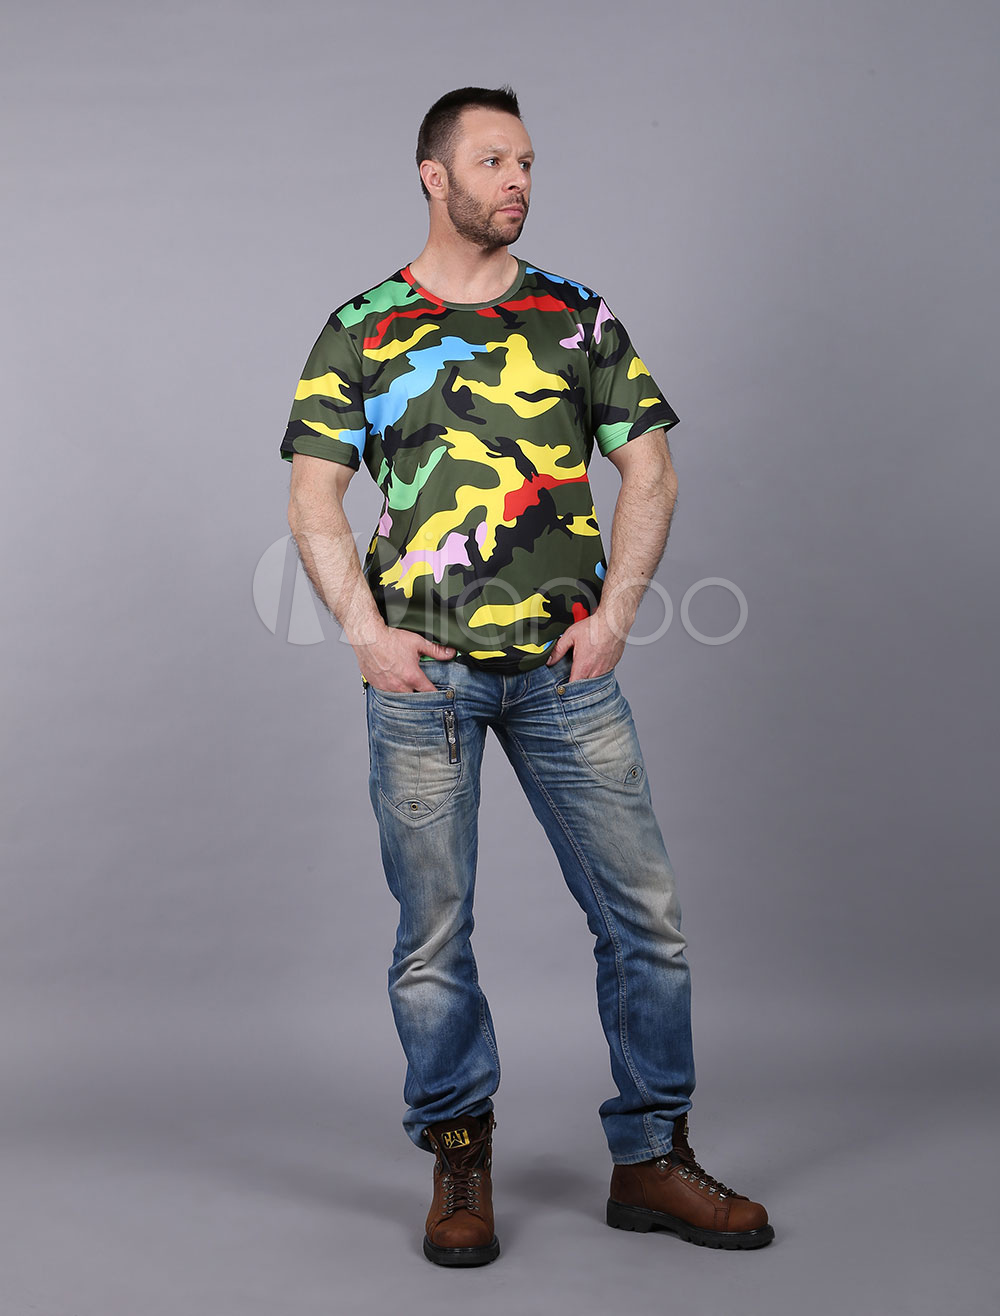 Men's Camouflage T Shirt Printed Short Sleeve Casual Side Zipper Hunter Green T-Shirts